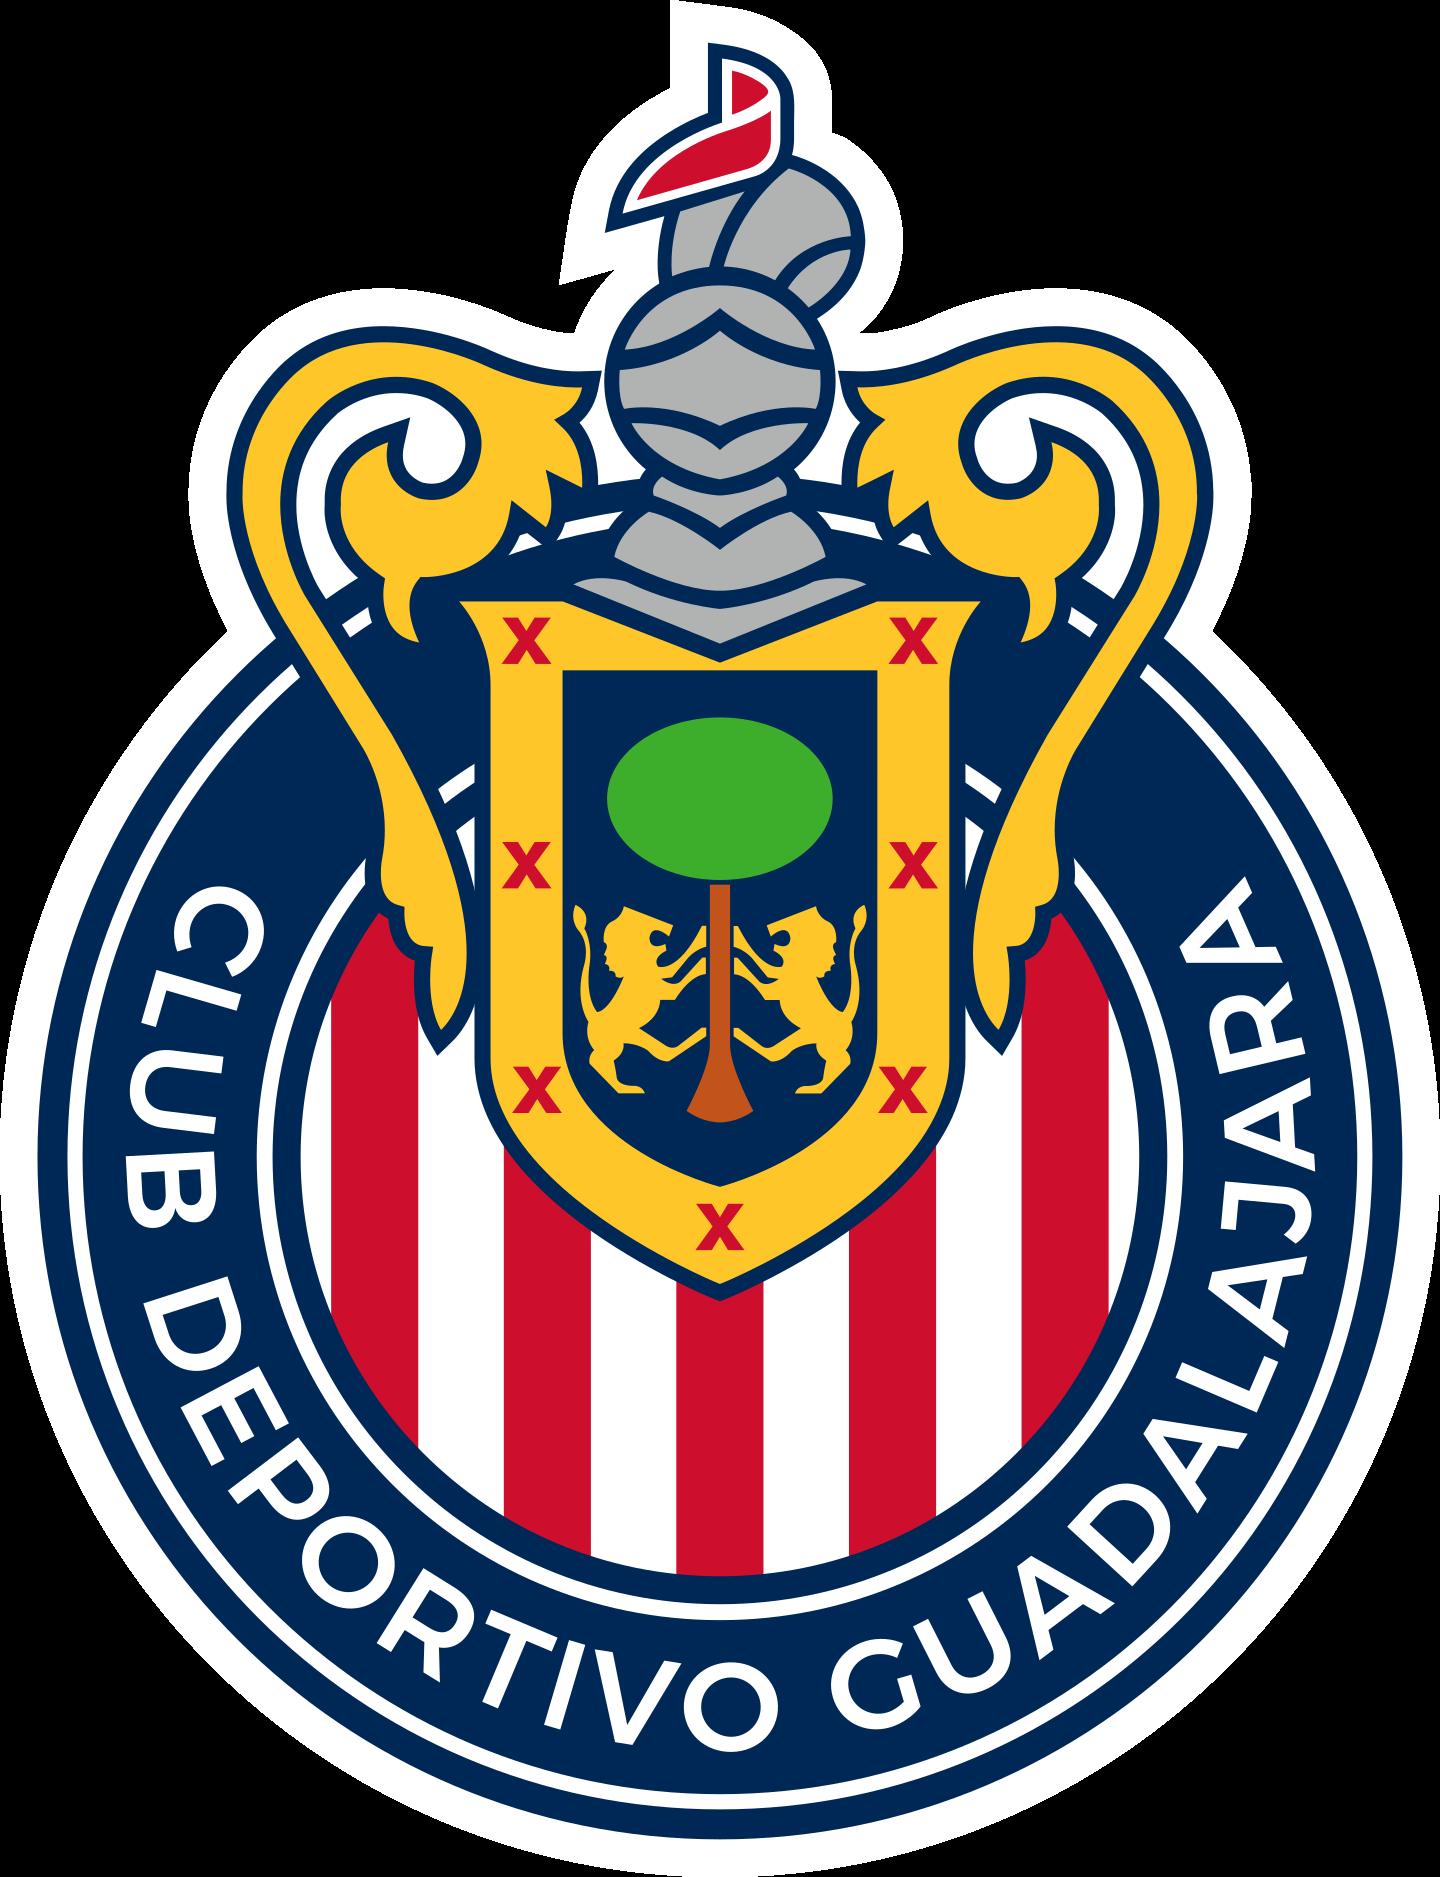 chivas guadalajara logo 2 - Chivas Guadalajara Logo - Escudo